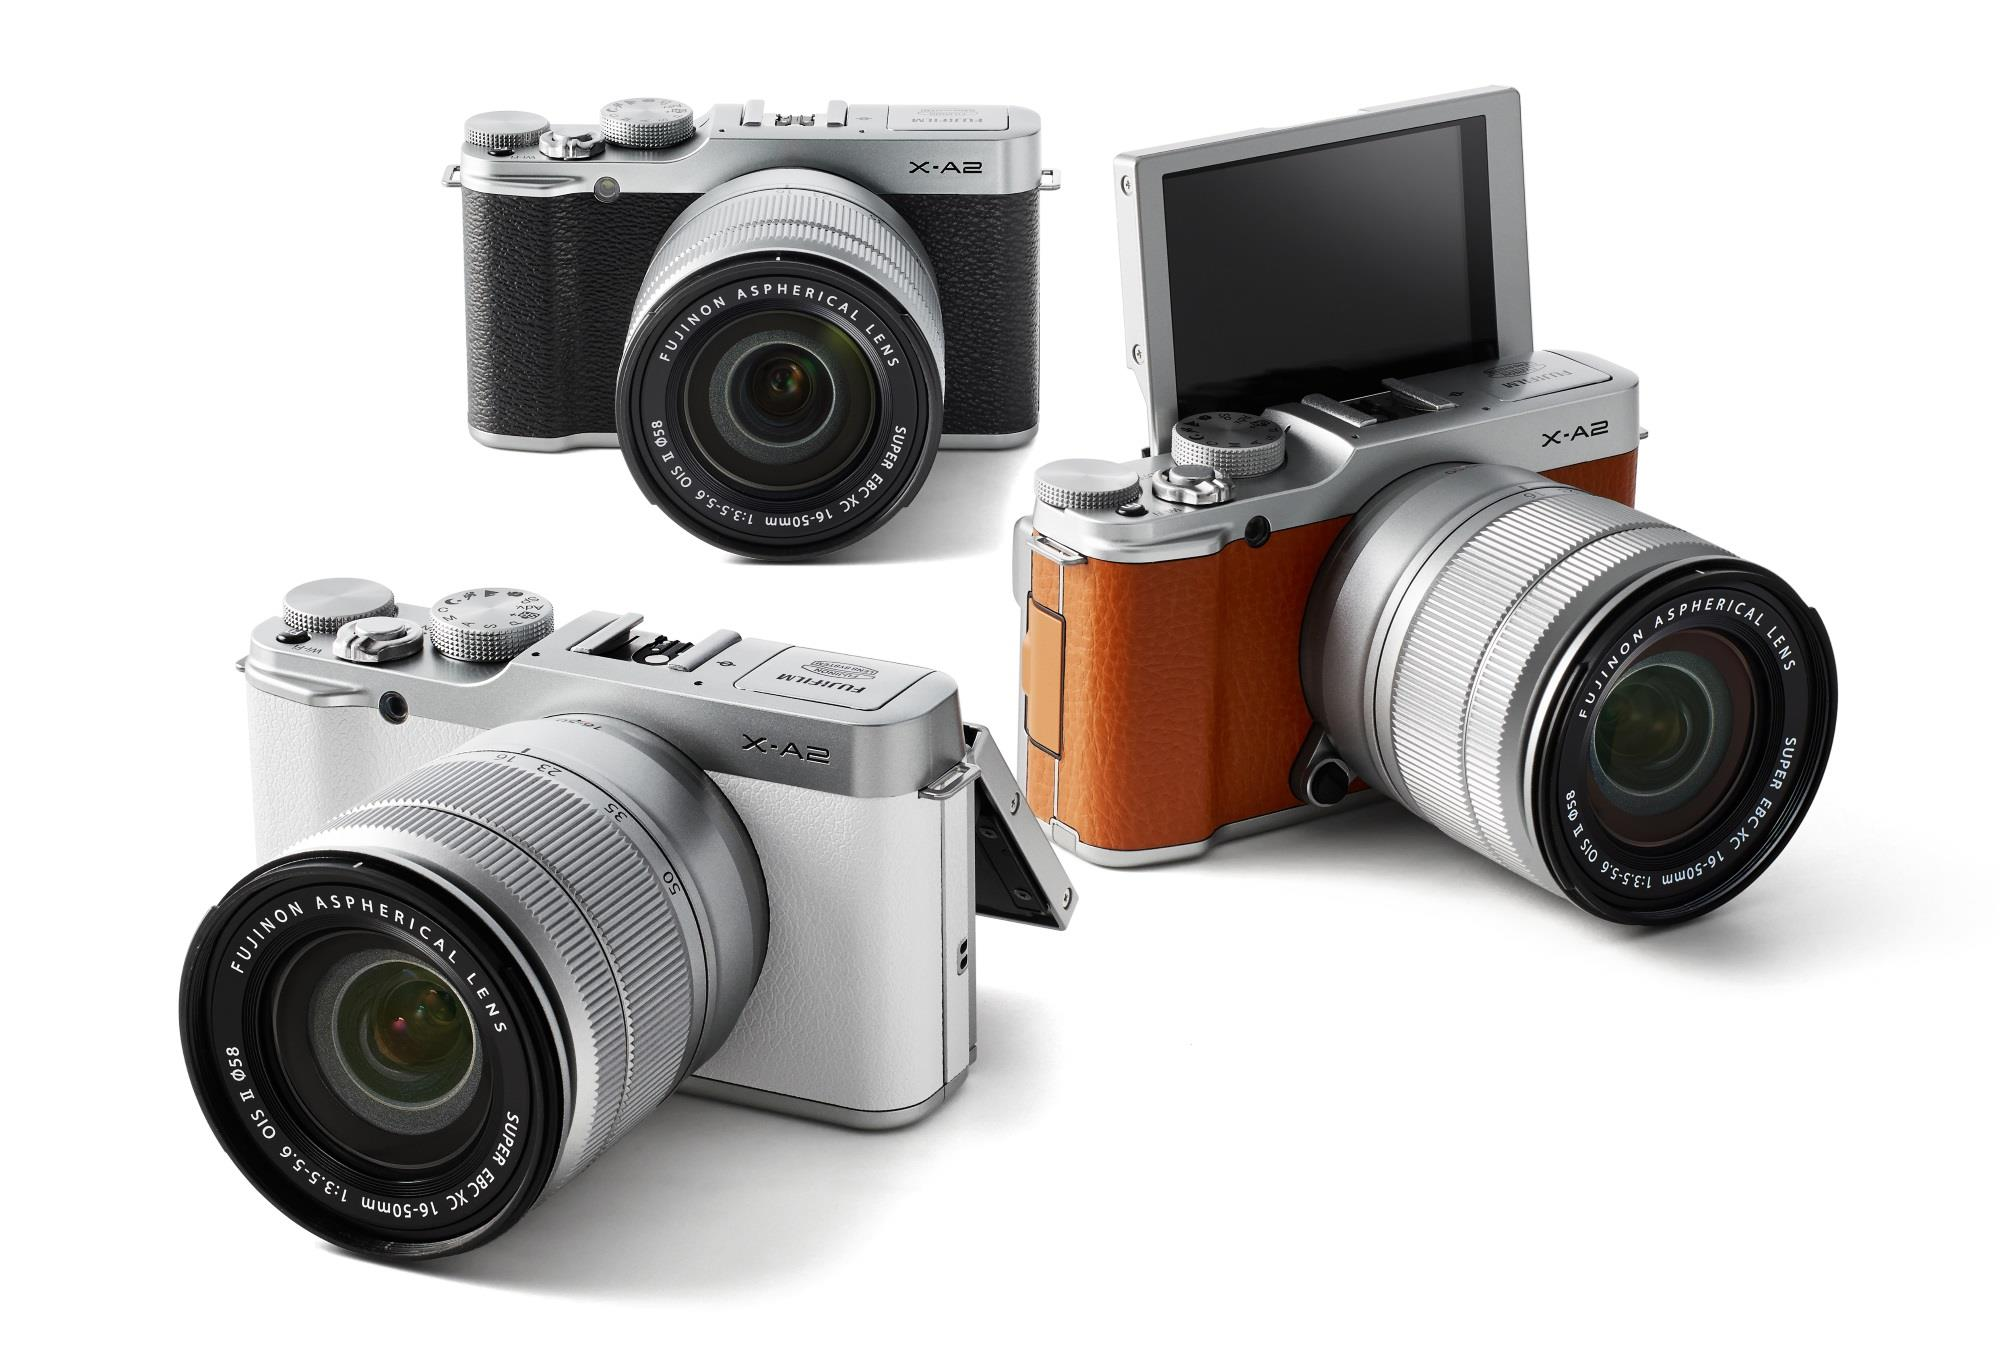 Fujifilm's X-A2 Camera Adds 'Selfie-Ready' LCD, New Lens